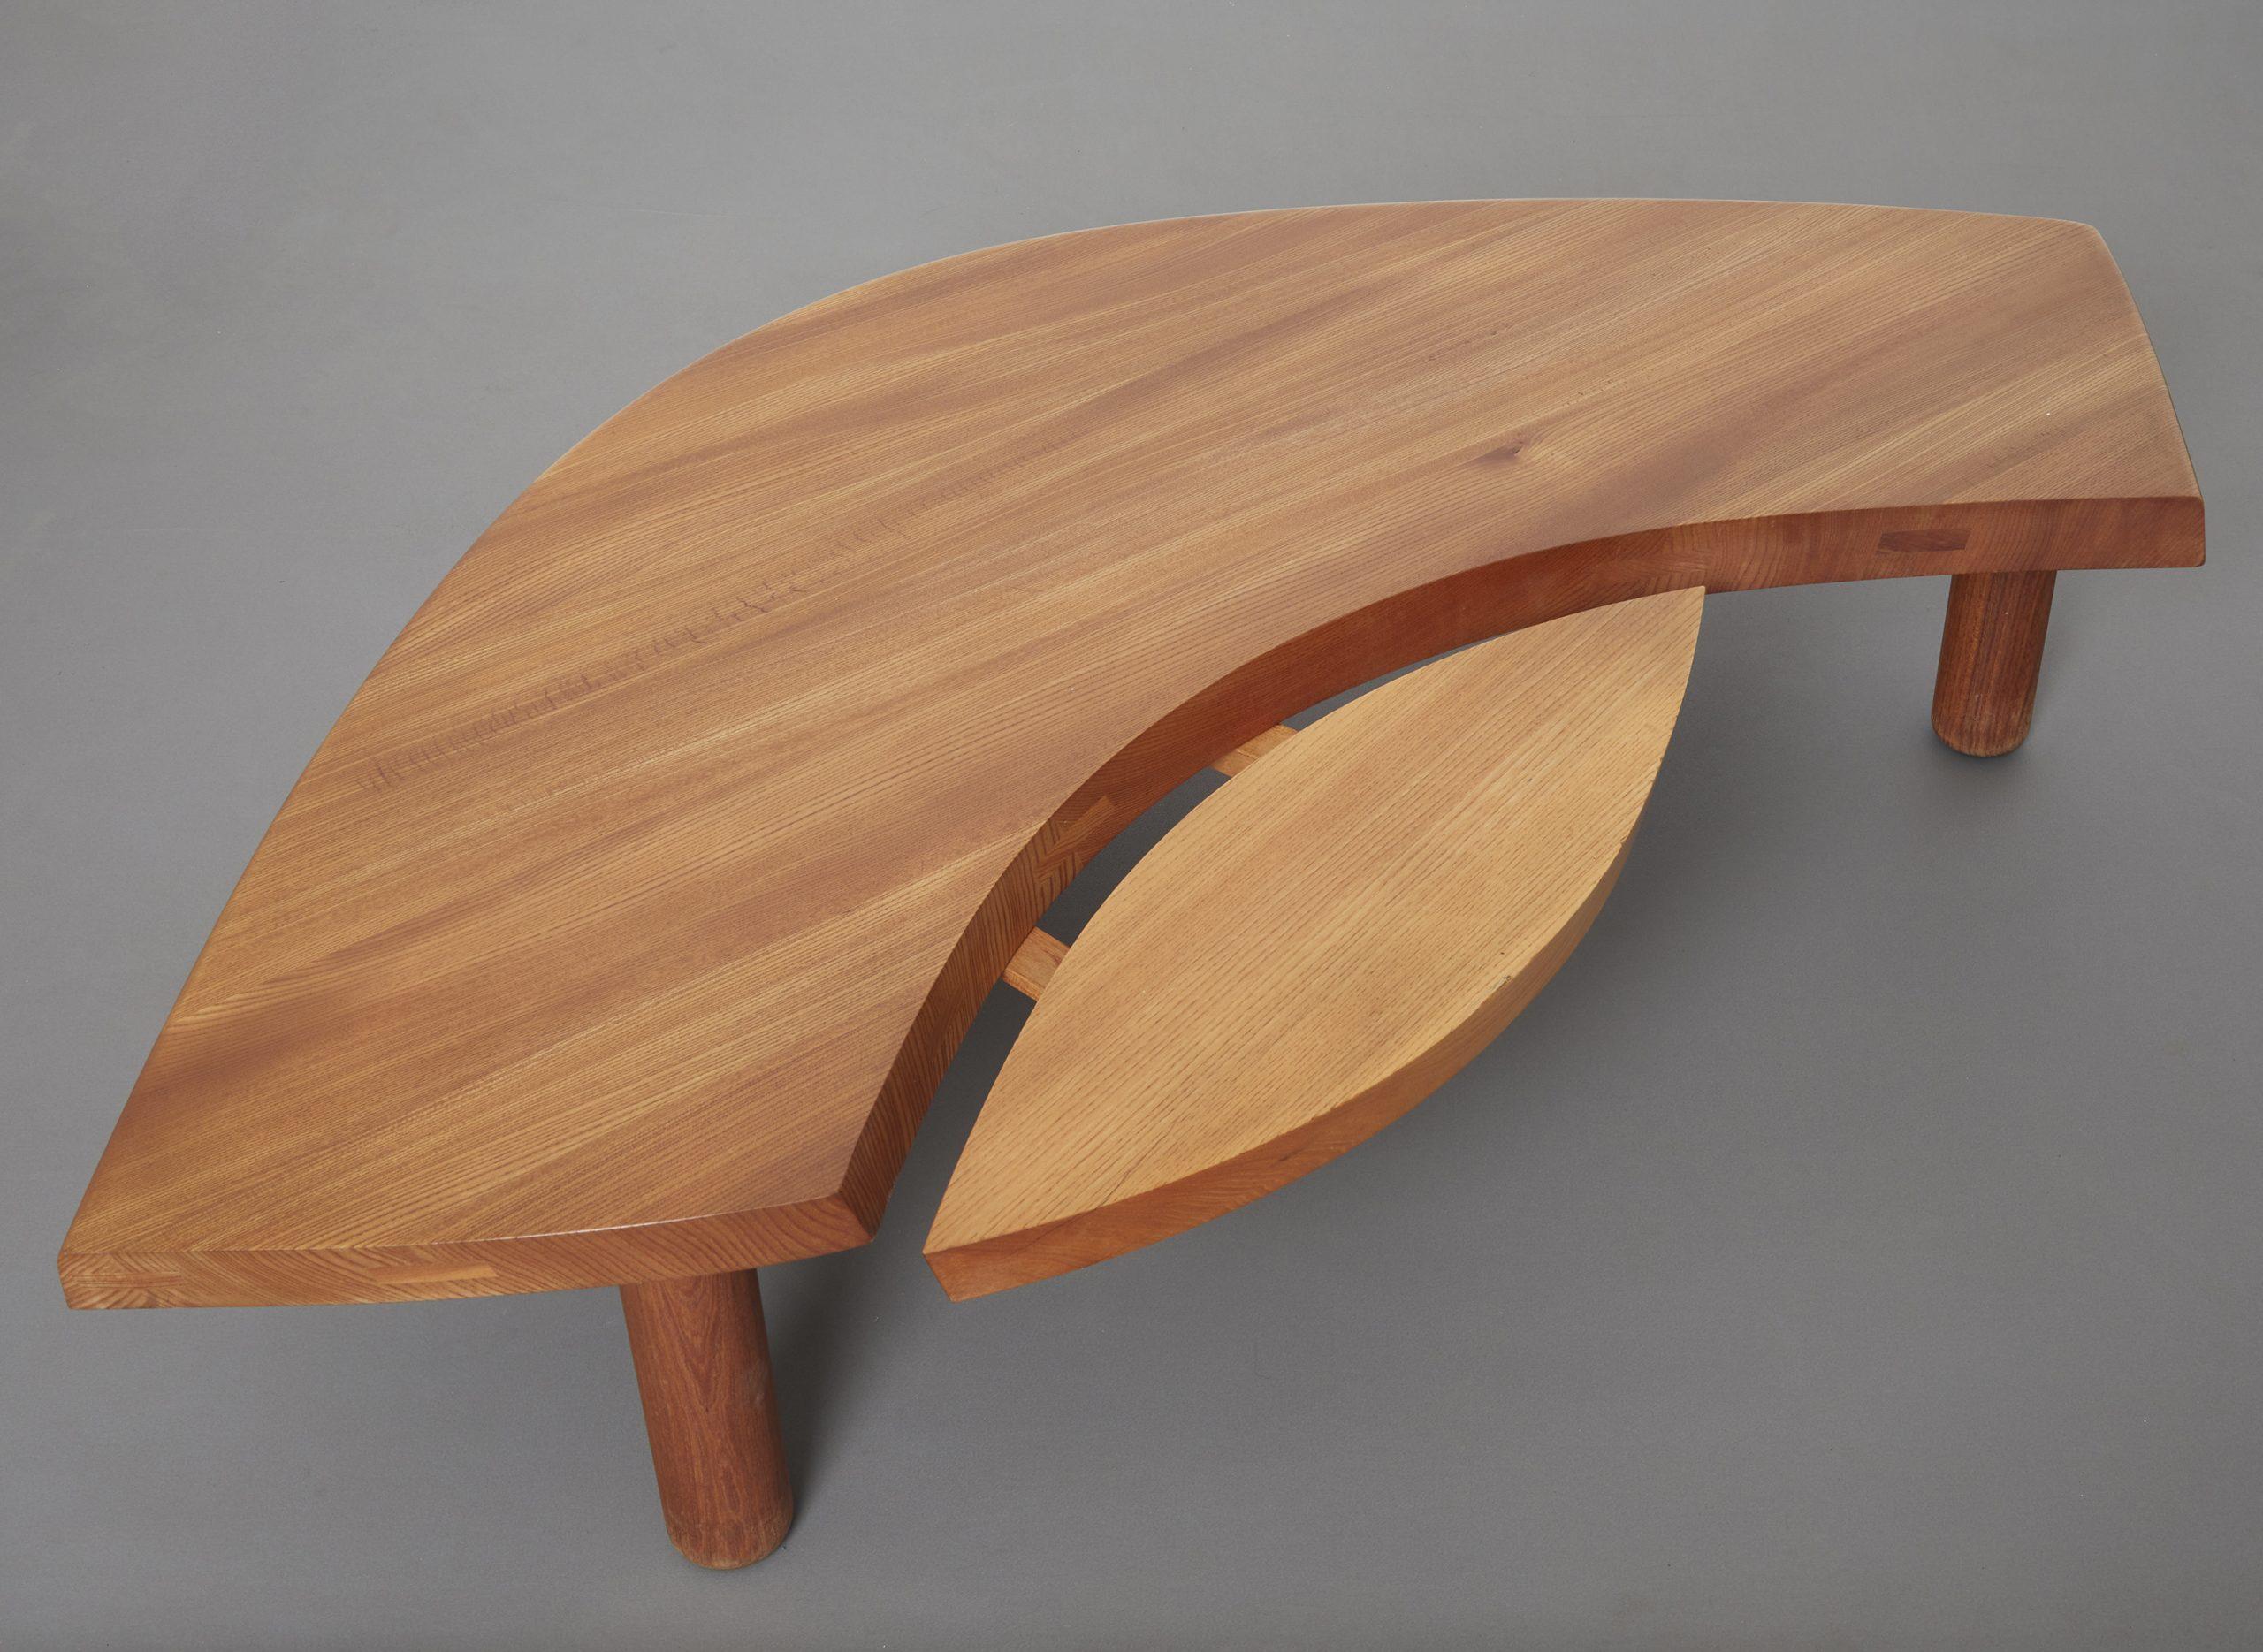 single-elmwood-low-table-t22-by-pierre-chapo-image-04